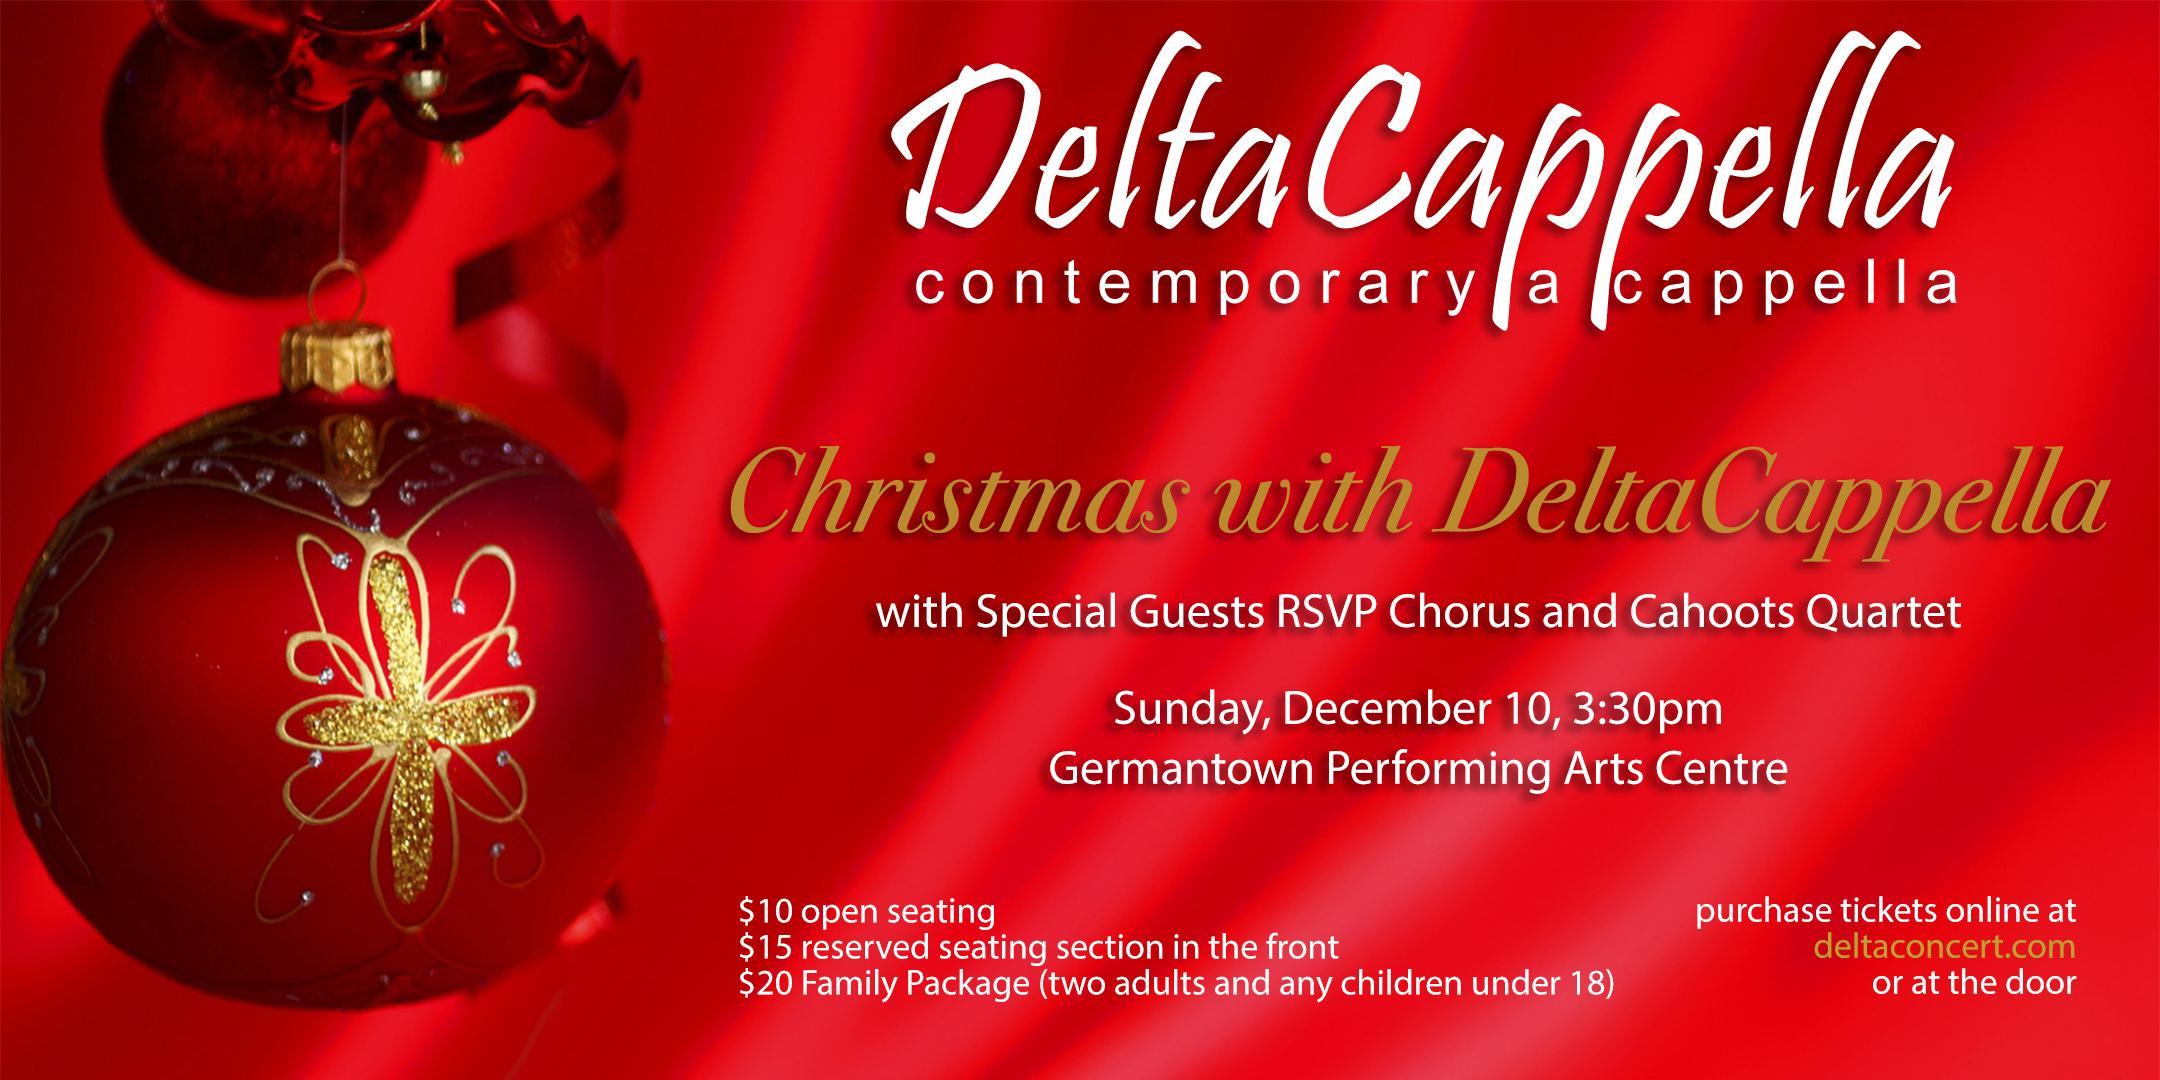 Christmas With Deltacappella | Germantown, TN | Germantown Performing Arts Center | December 10, 2017